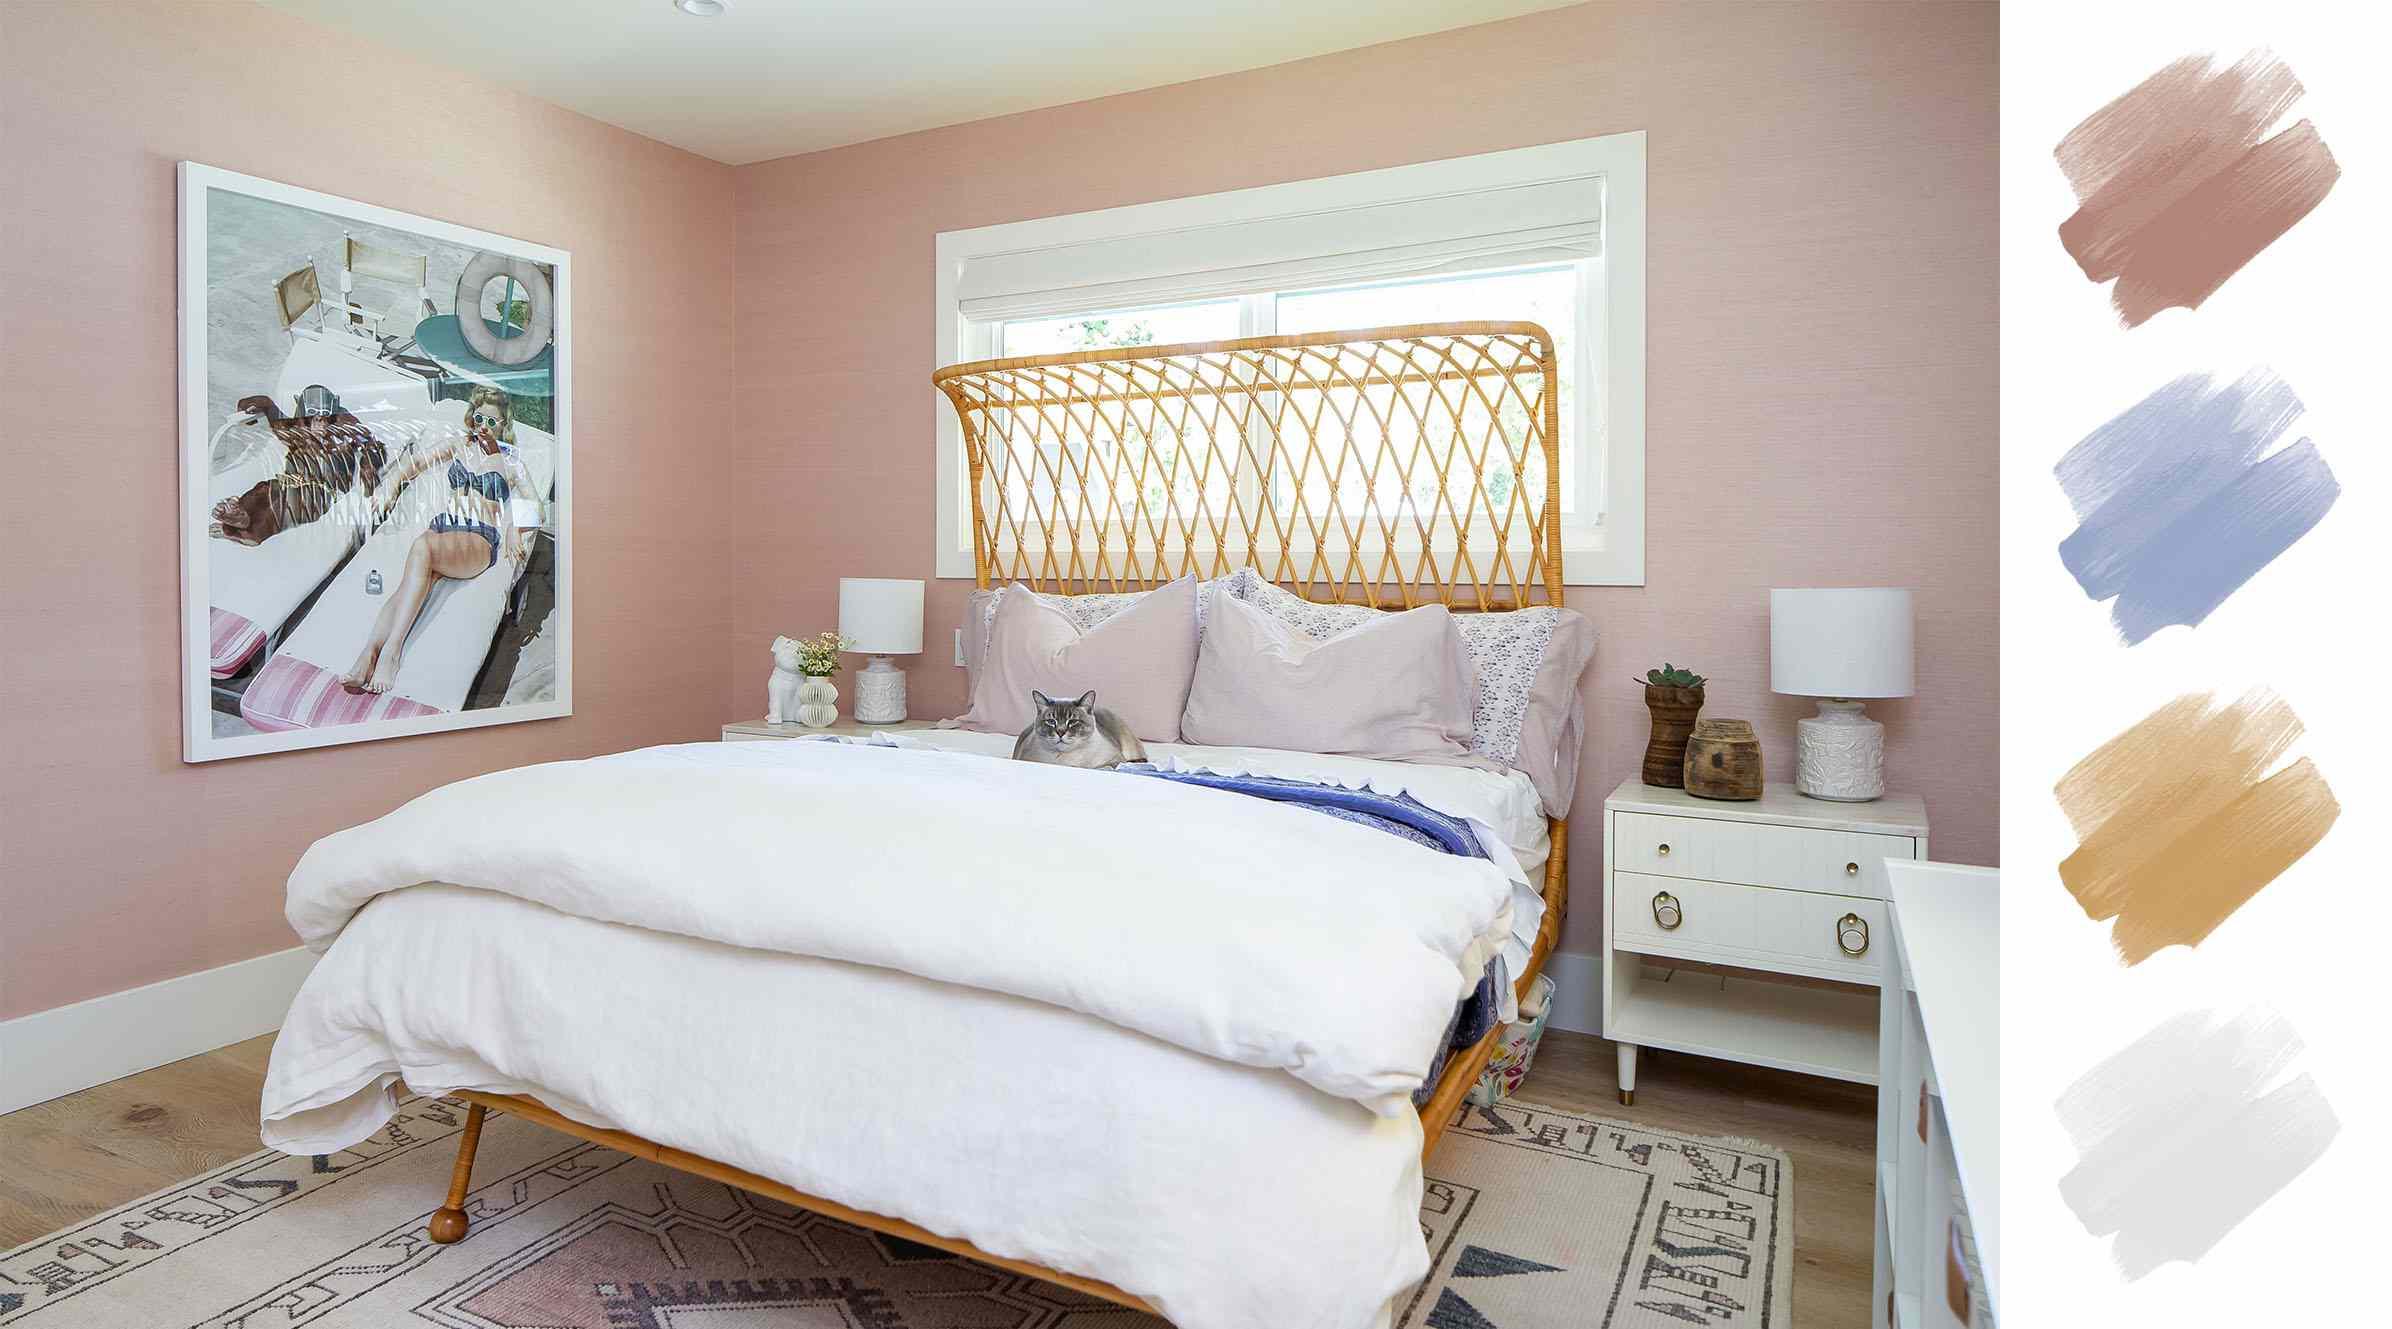 bedroom color schemes - pink + blue + white + wood